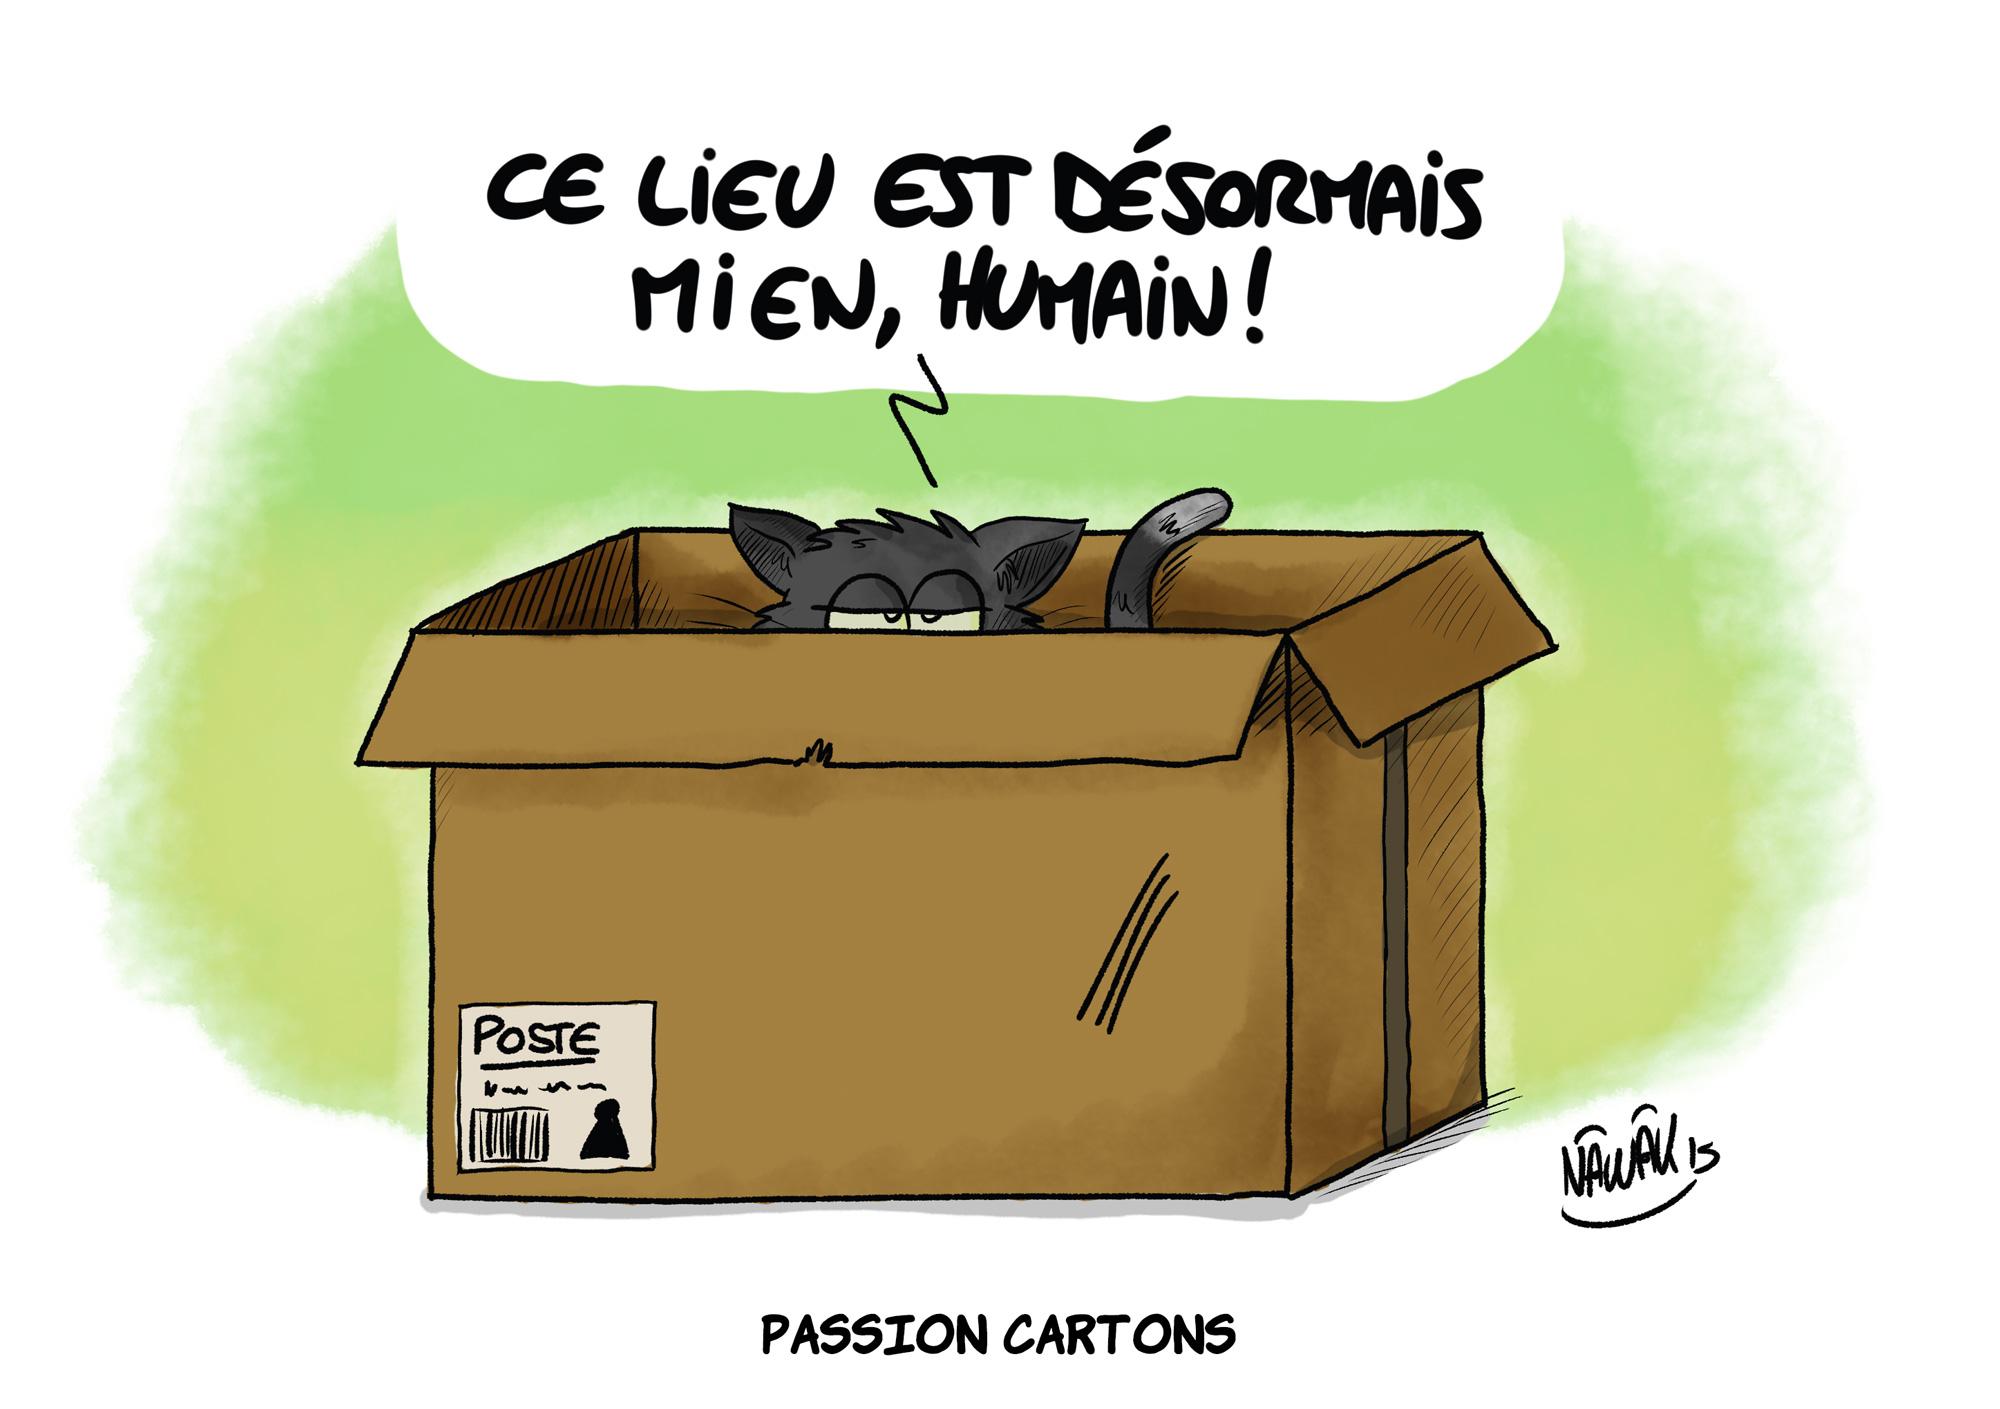 Passion carton